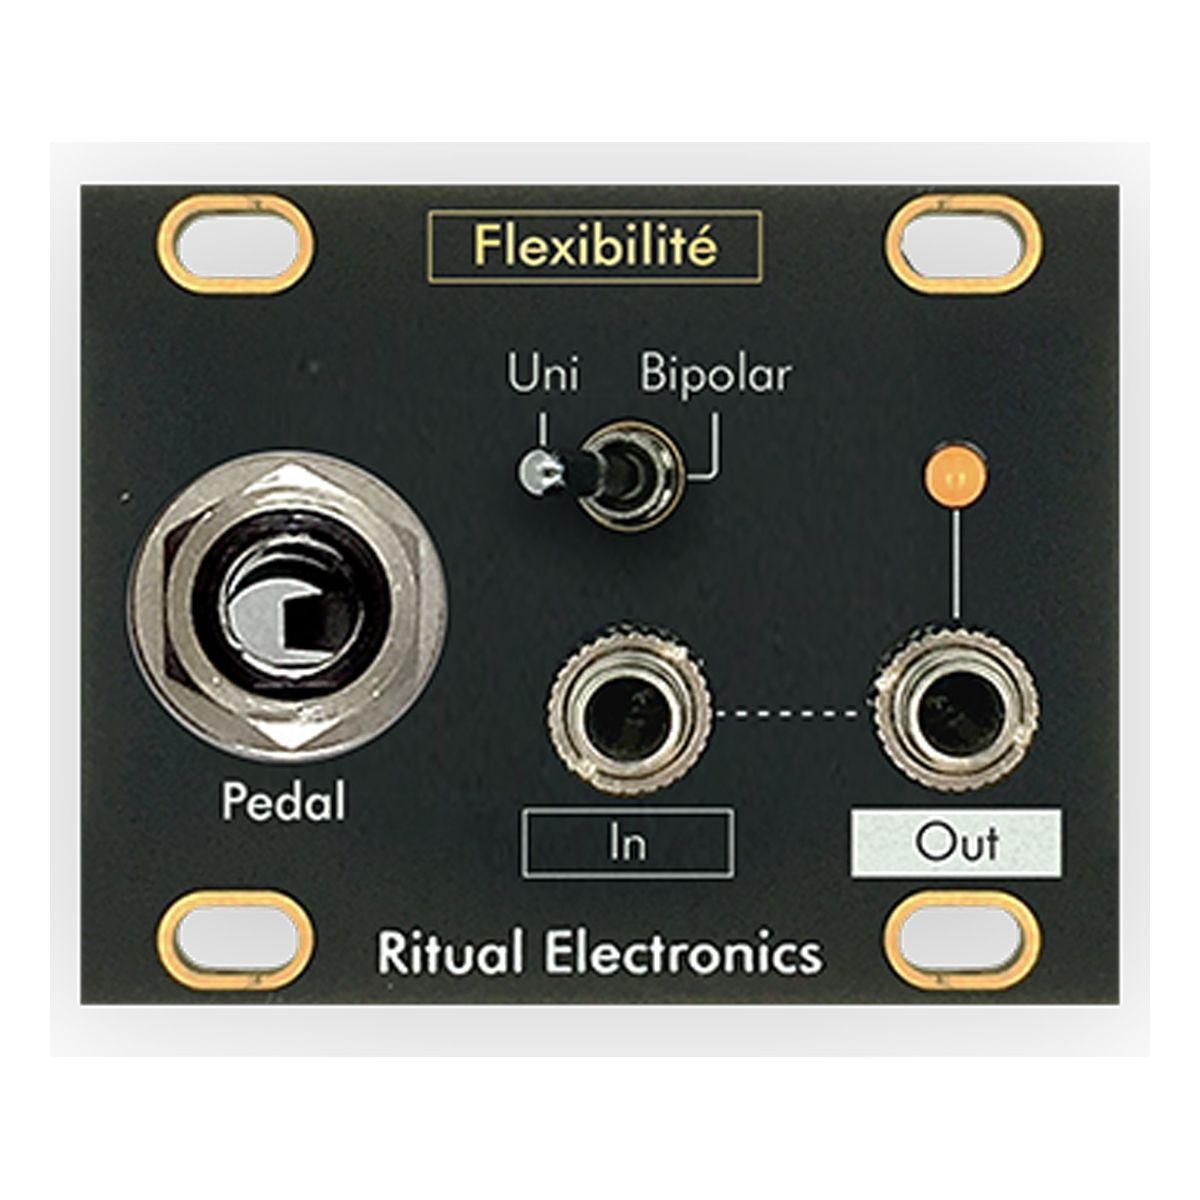 Ritual Electronics Flexibilite Eurorack 1U Expression Pedal Module